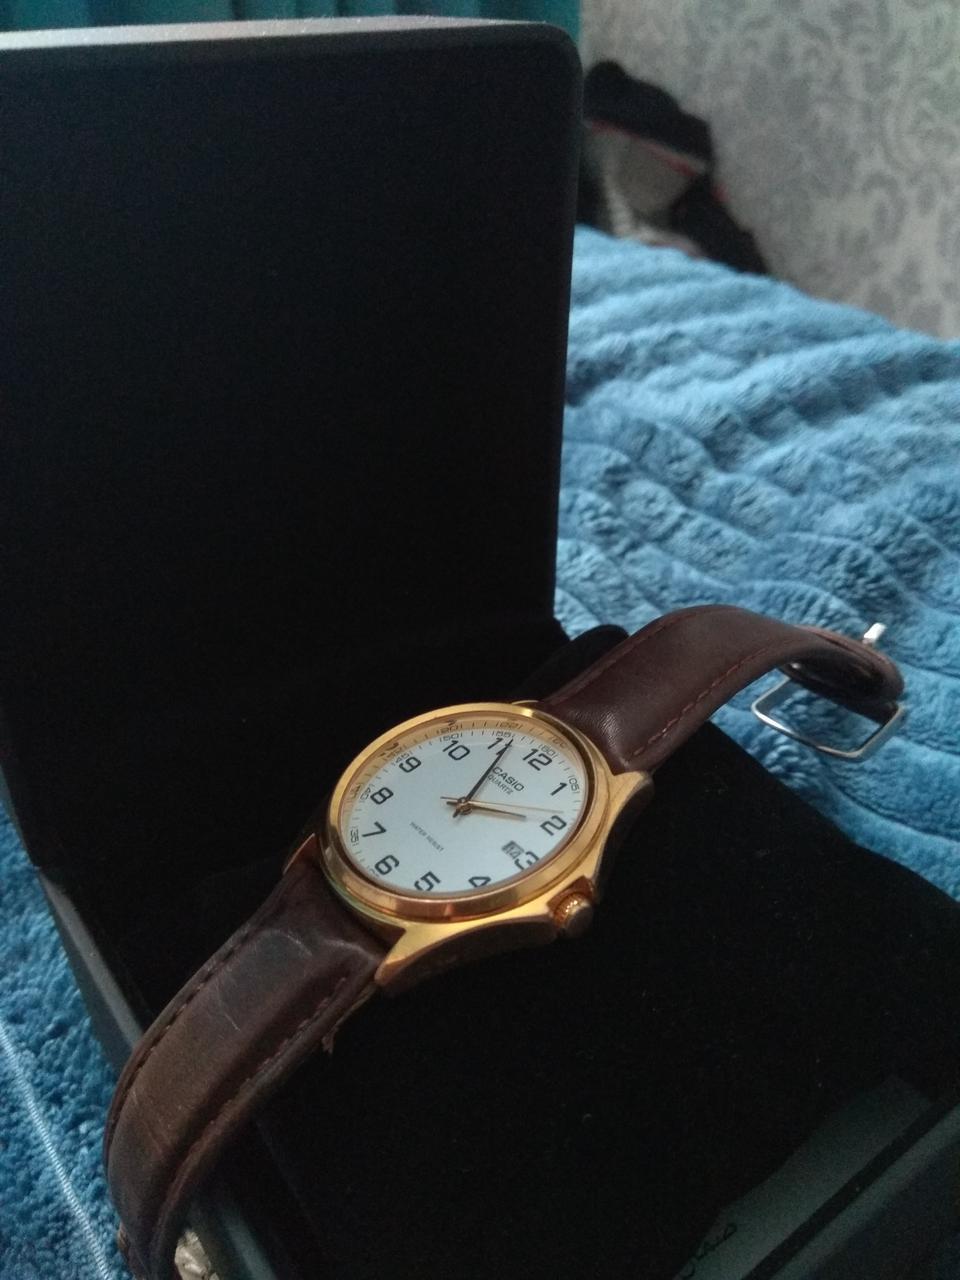 5d6bc4e1549d Продам часы Casio, цена 290 грн., купить — Prom.ua (ID 737156452)